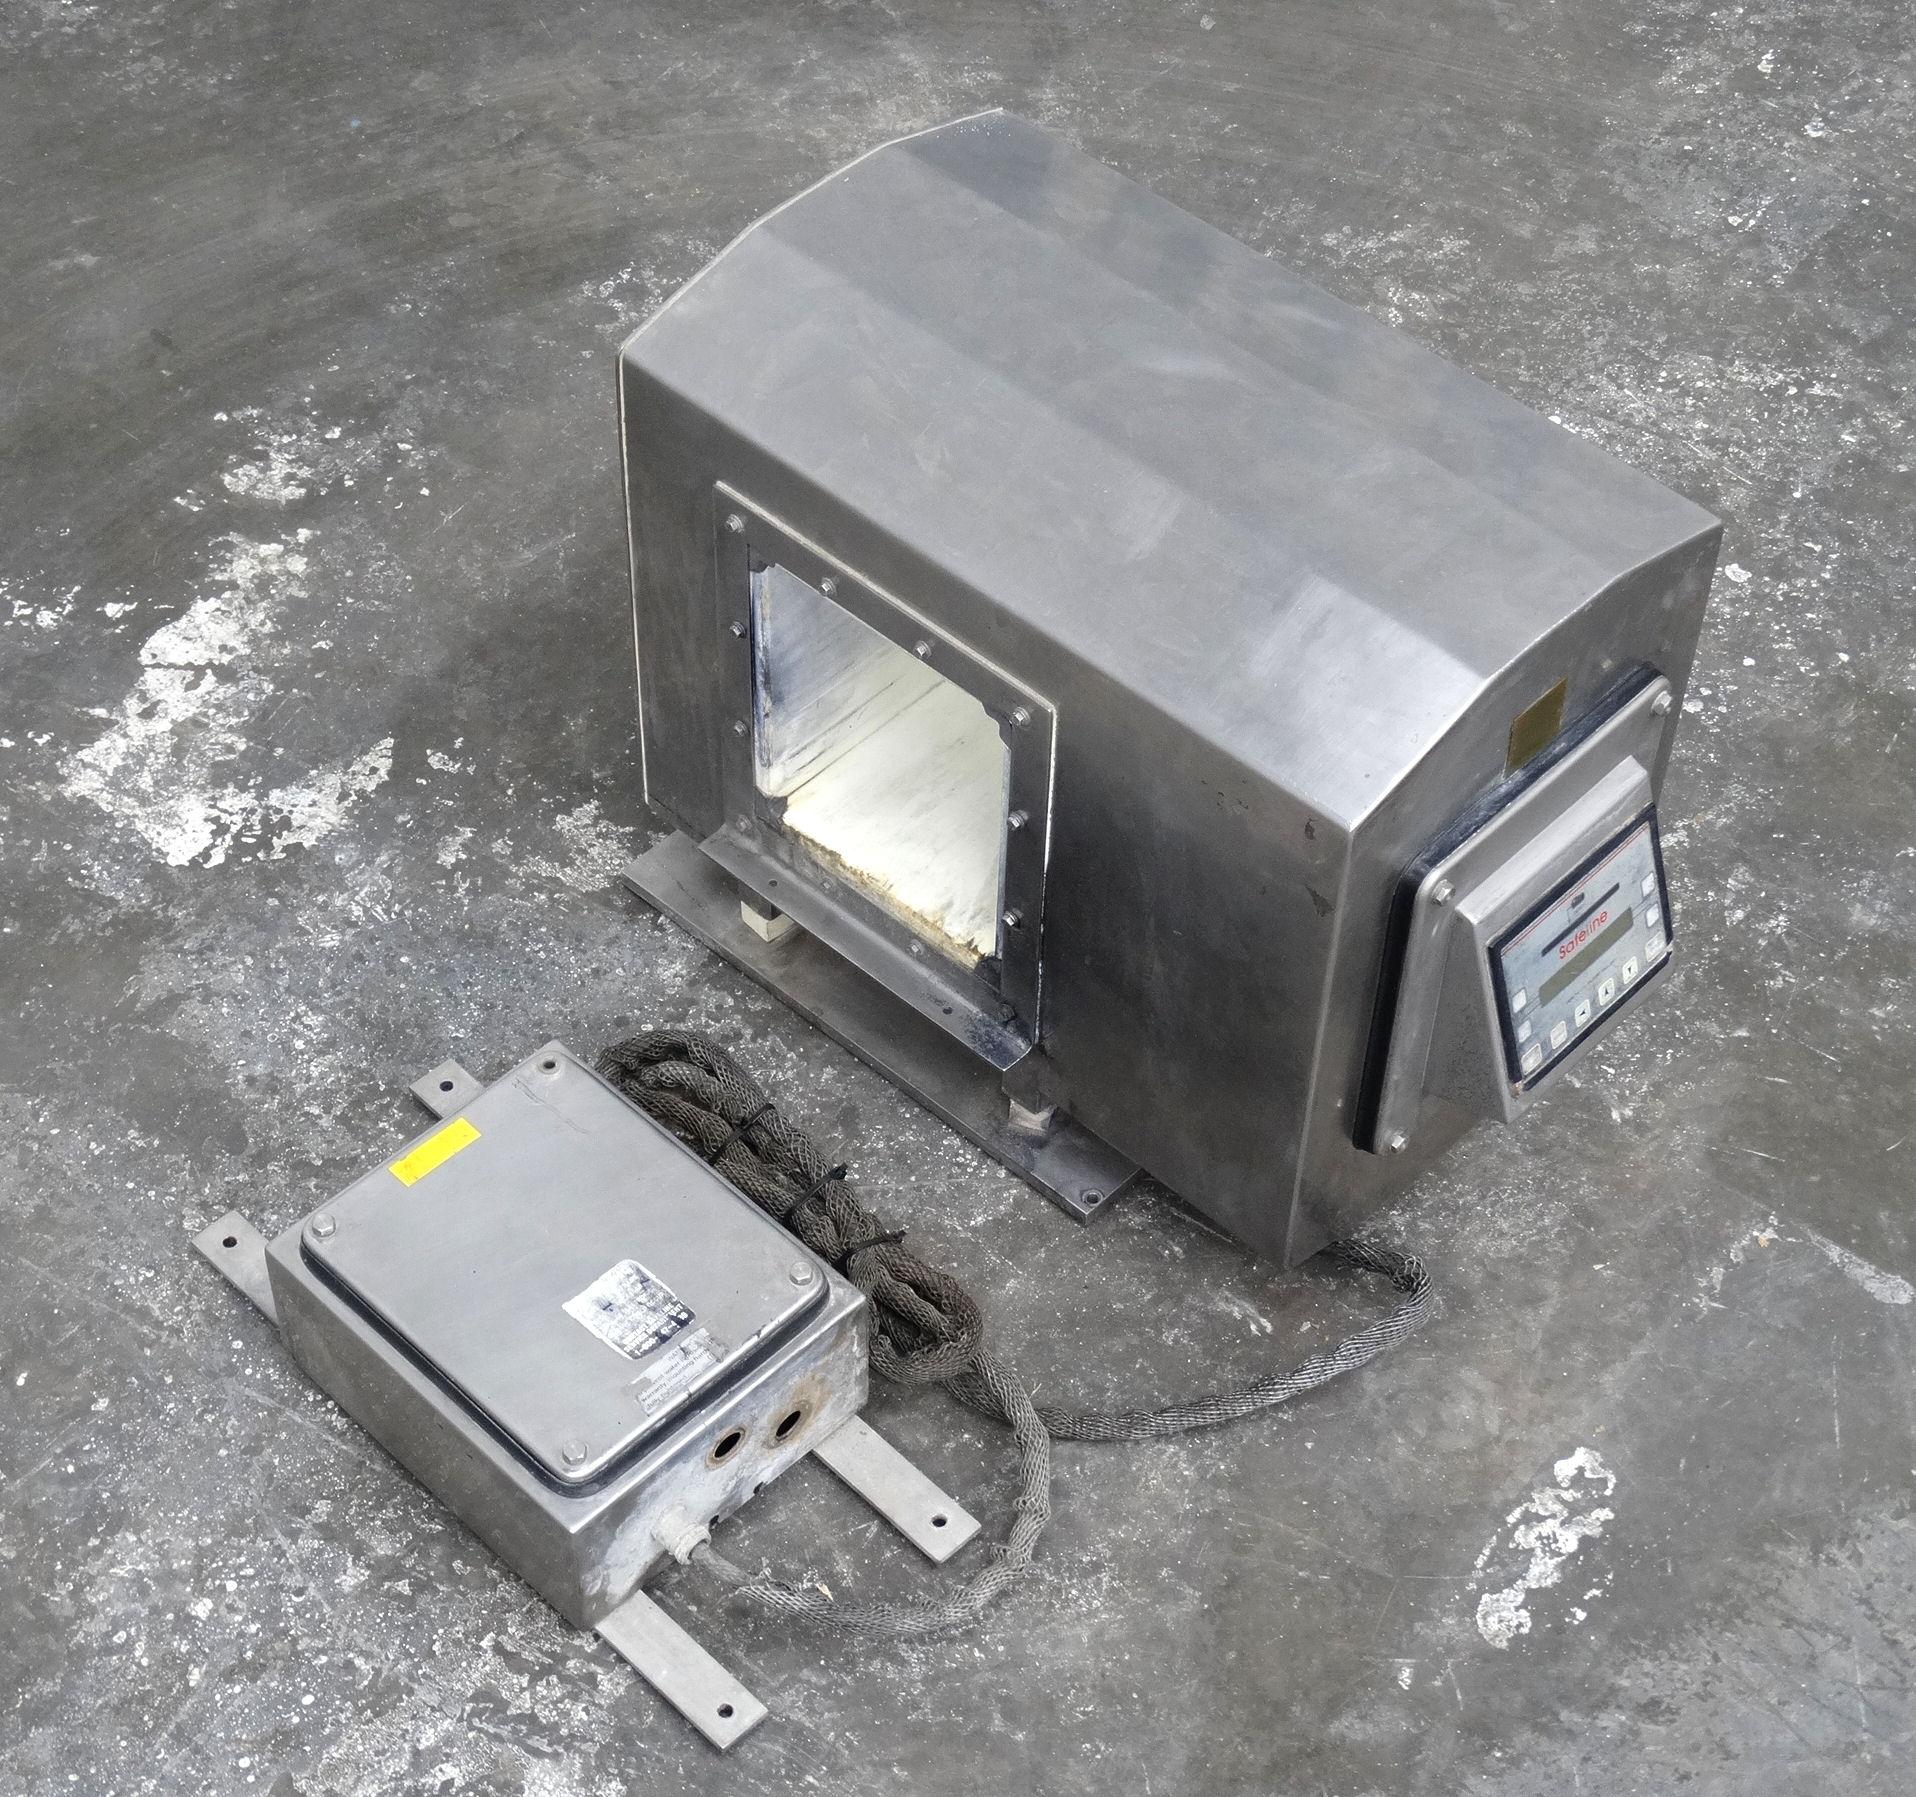 "Safeline Metal Detector Head 7.75""W x 7""H Opening B2157 - Image 3 of 8"